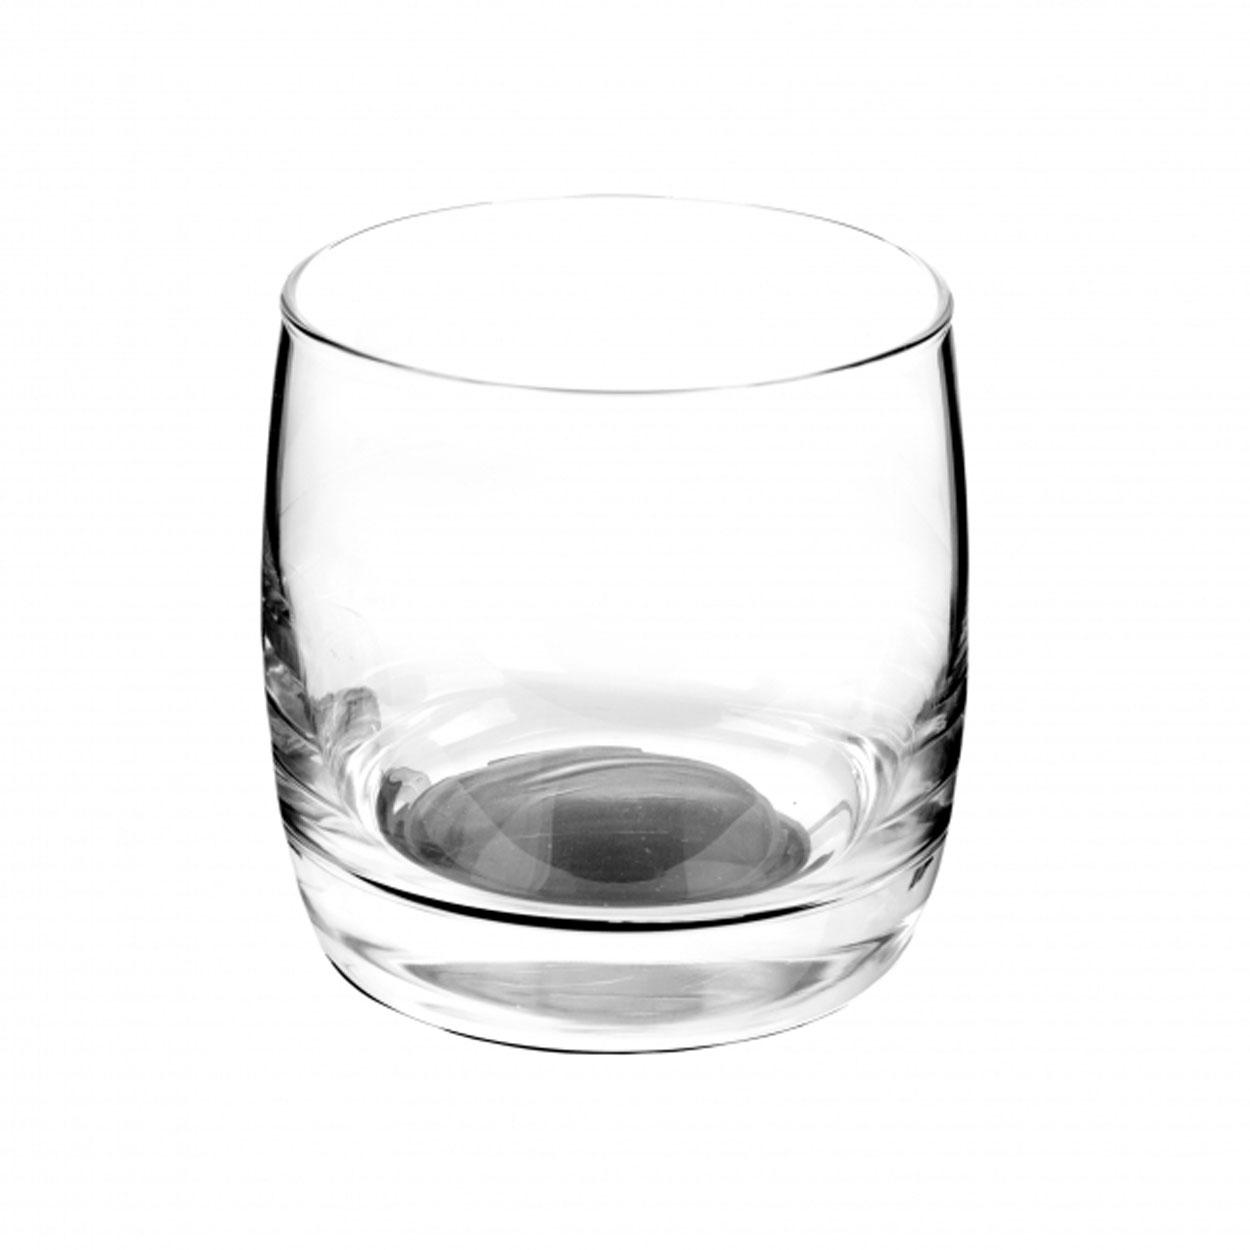 Набор стаканов Luminarc Luminarc French Brasserie, 310 мл, 6 шт набор стаканов luminarc new america 270 мл 6 шт